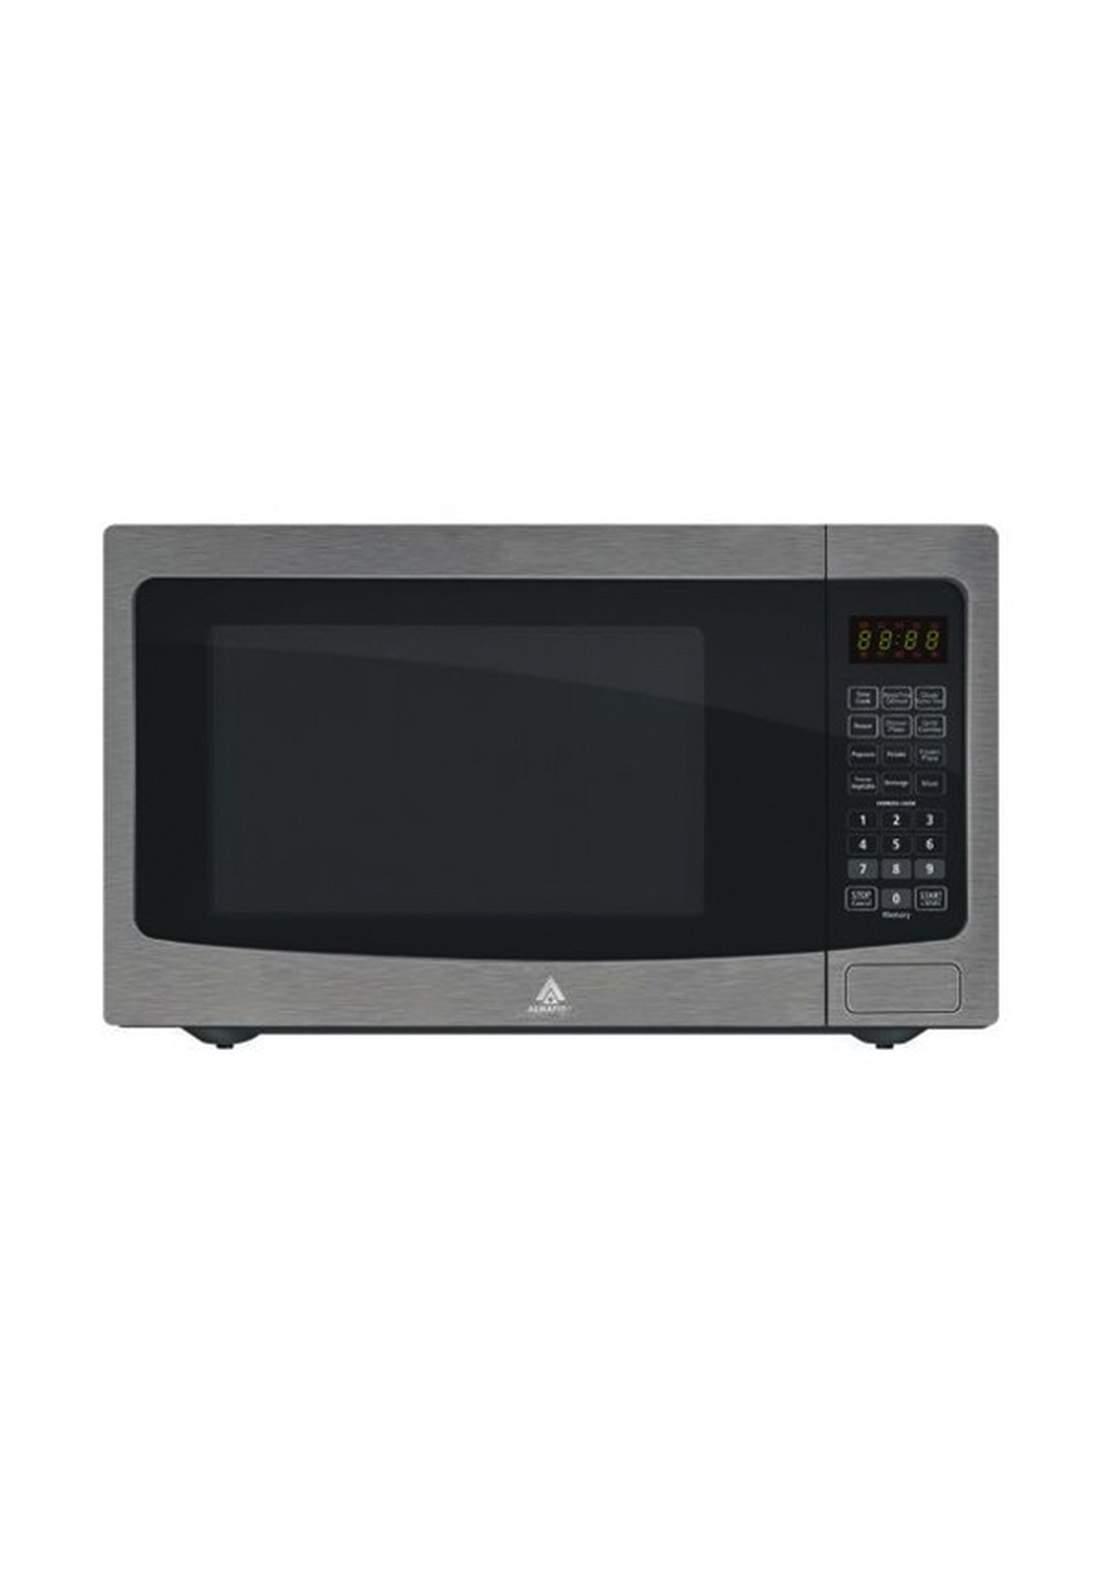 Alhafidh MWHA-42G3H Grill Microwave Oven 42L فرن ميكروويف شواية